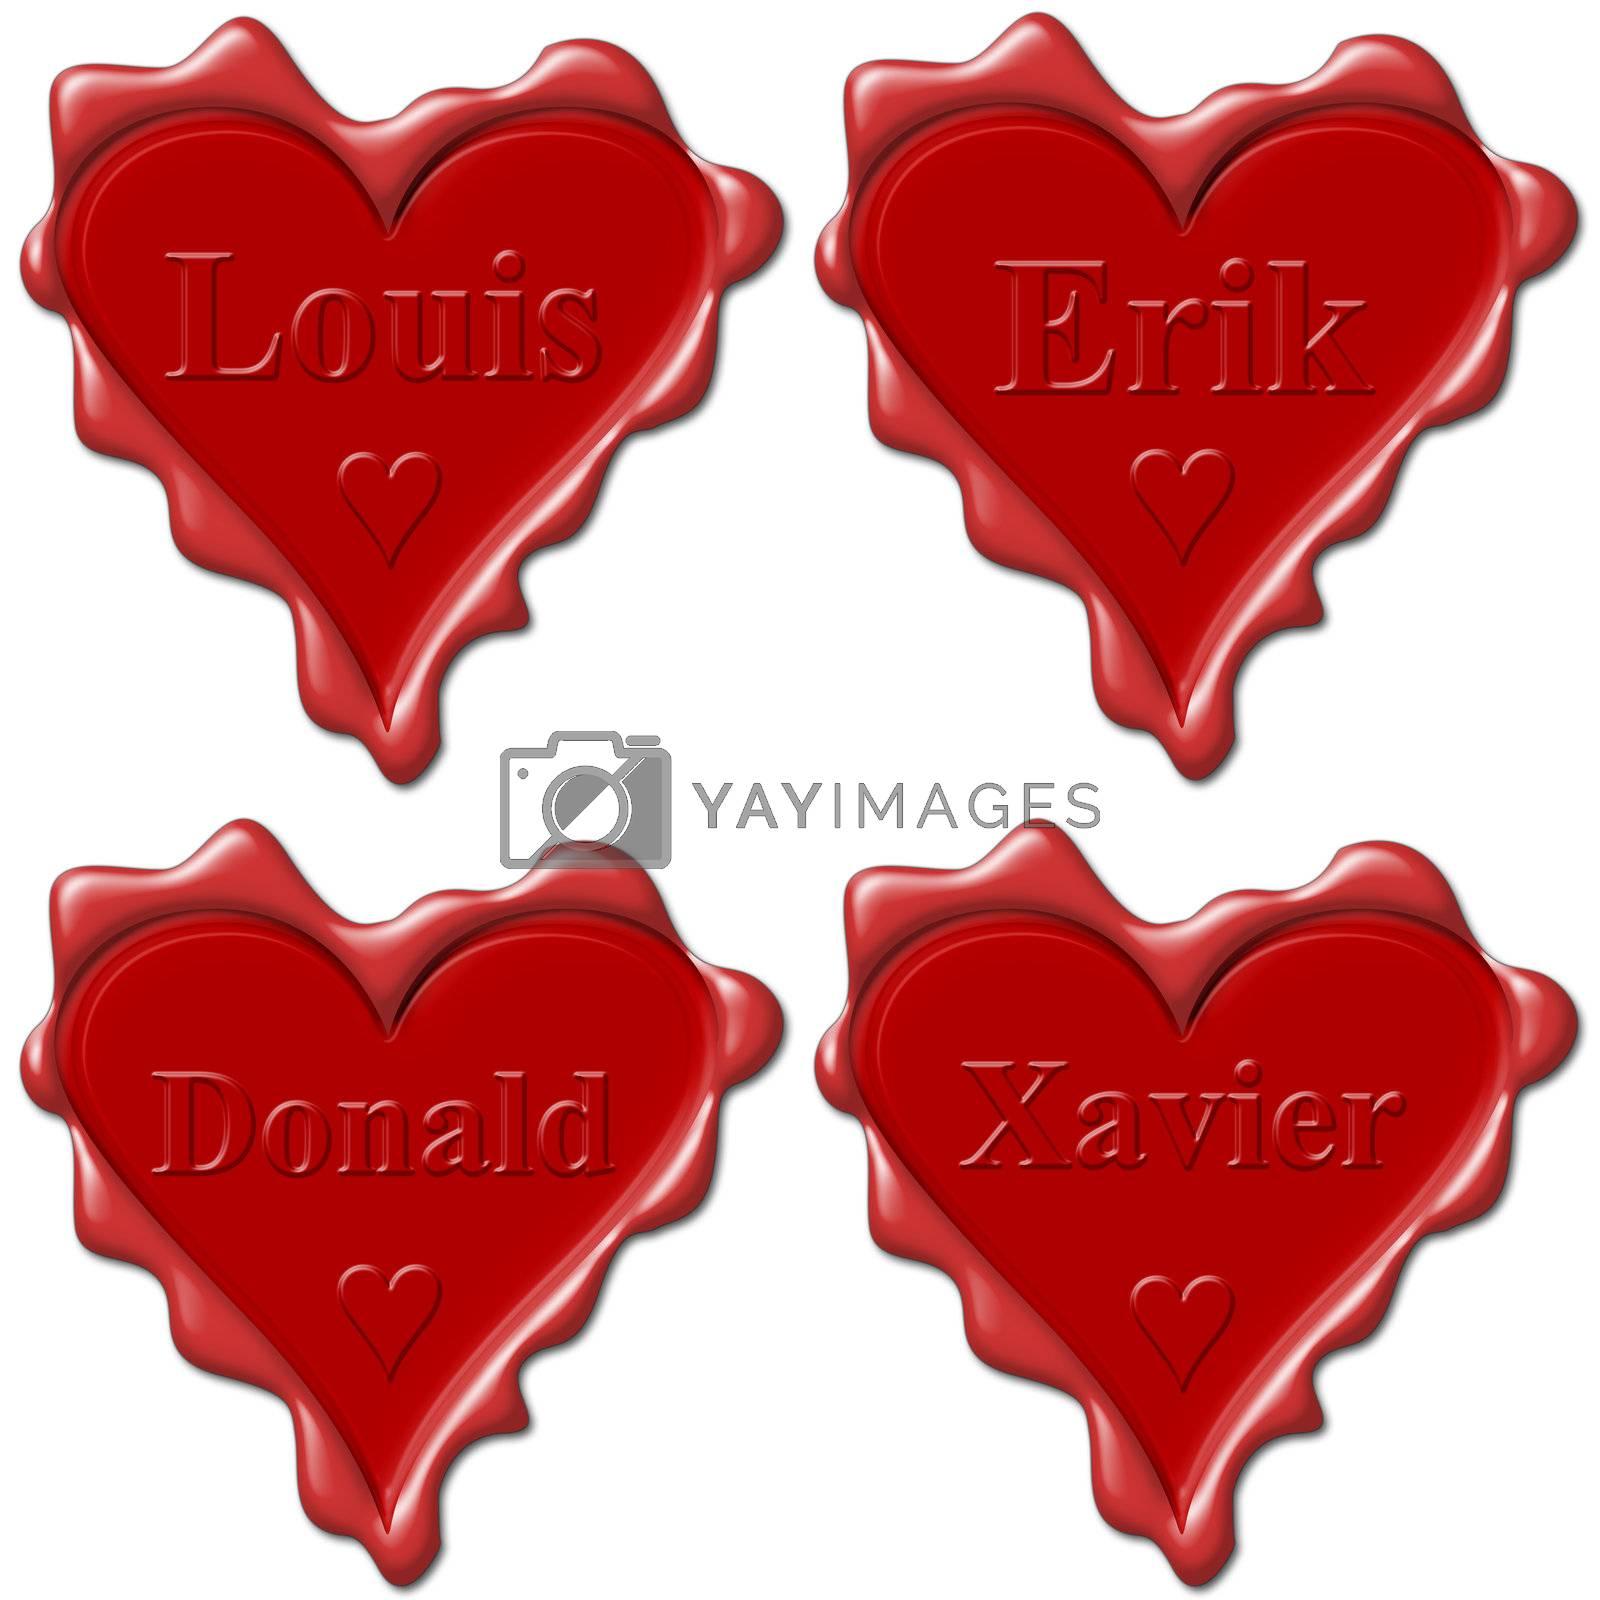 Valentine love hearts with names: Louis, Erik, Donald, Xavier